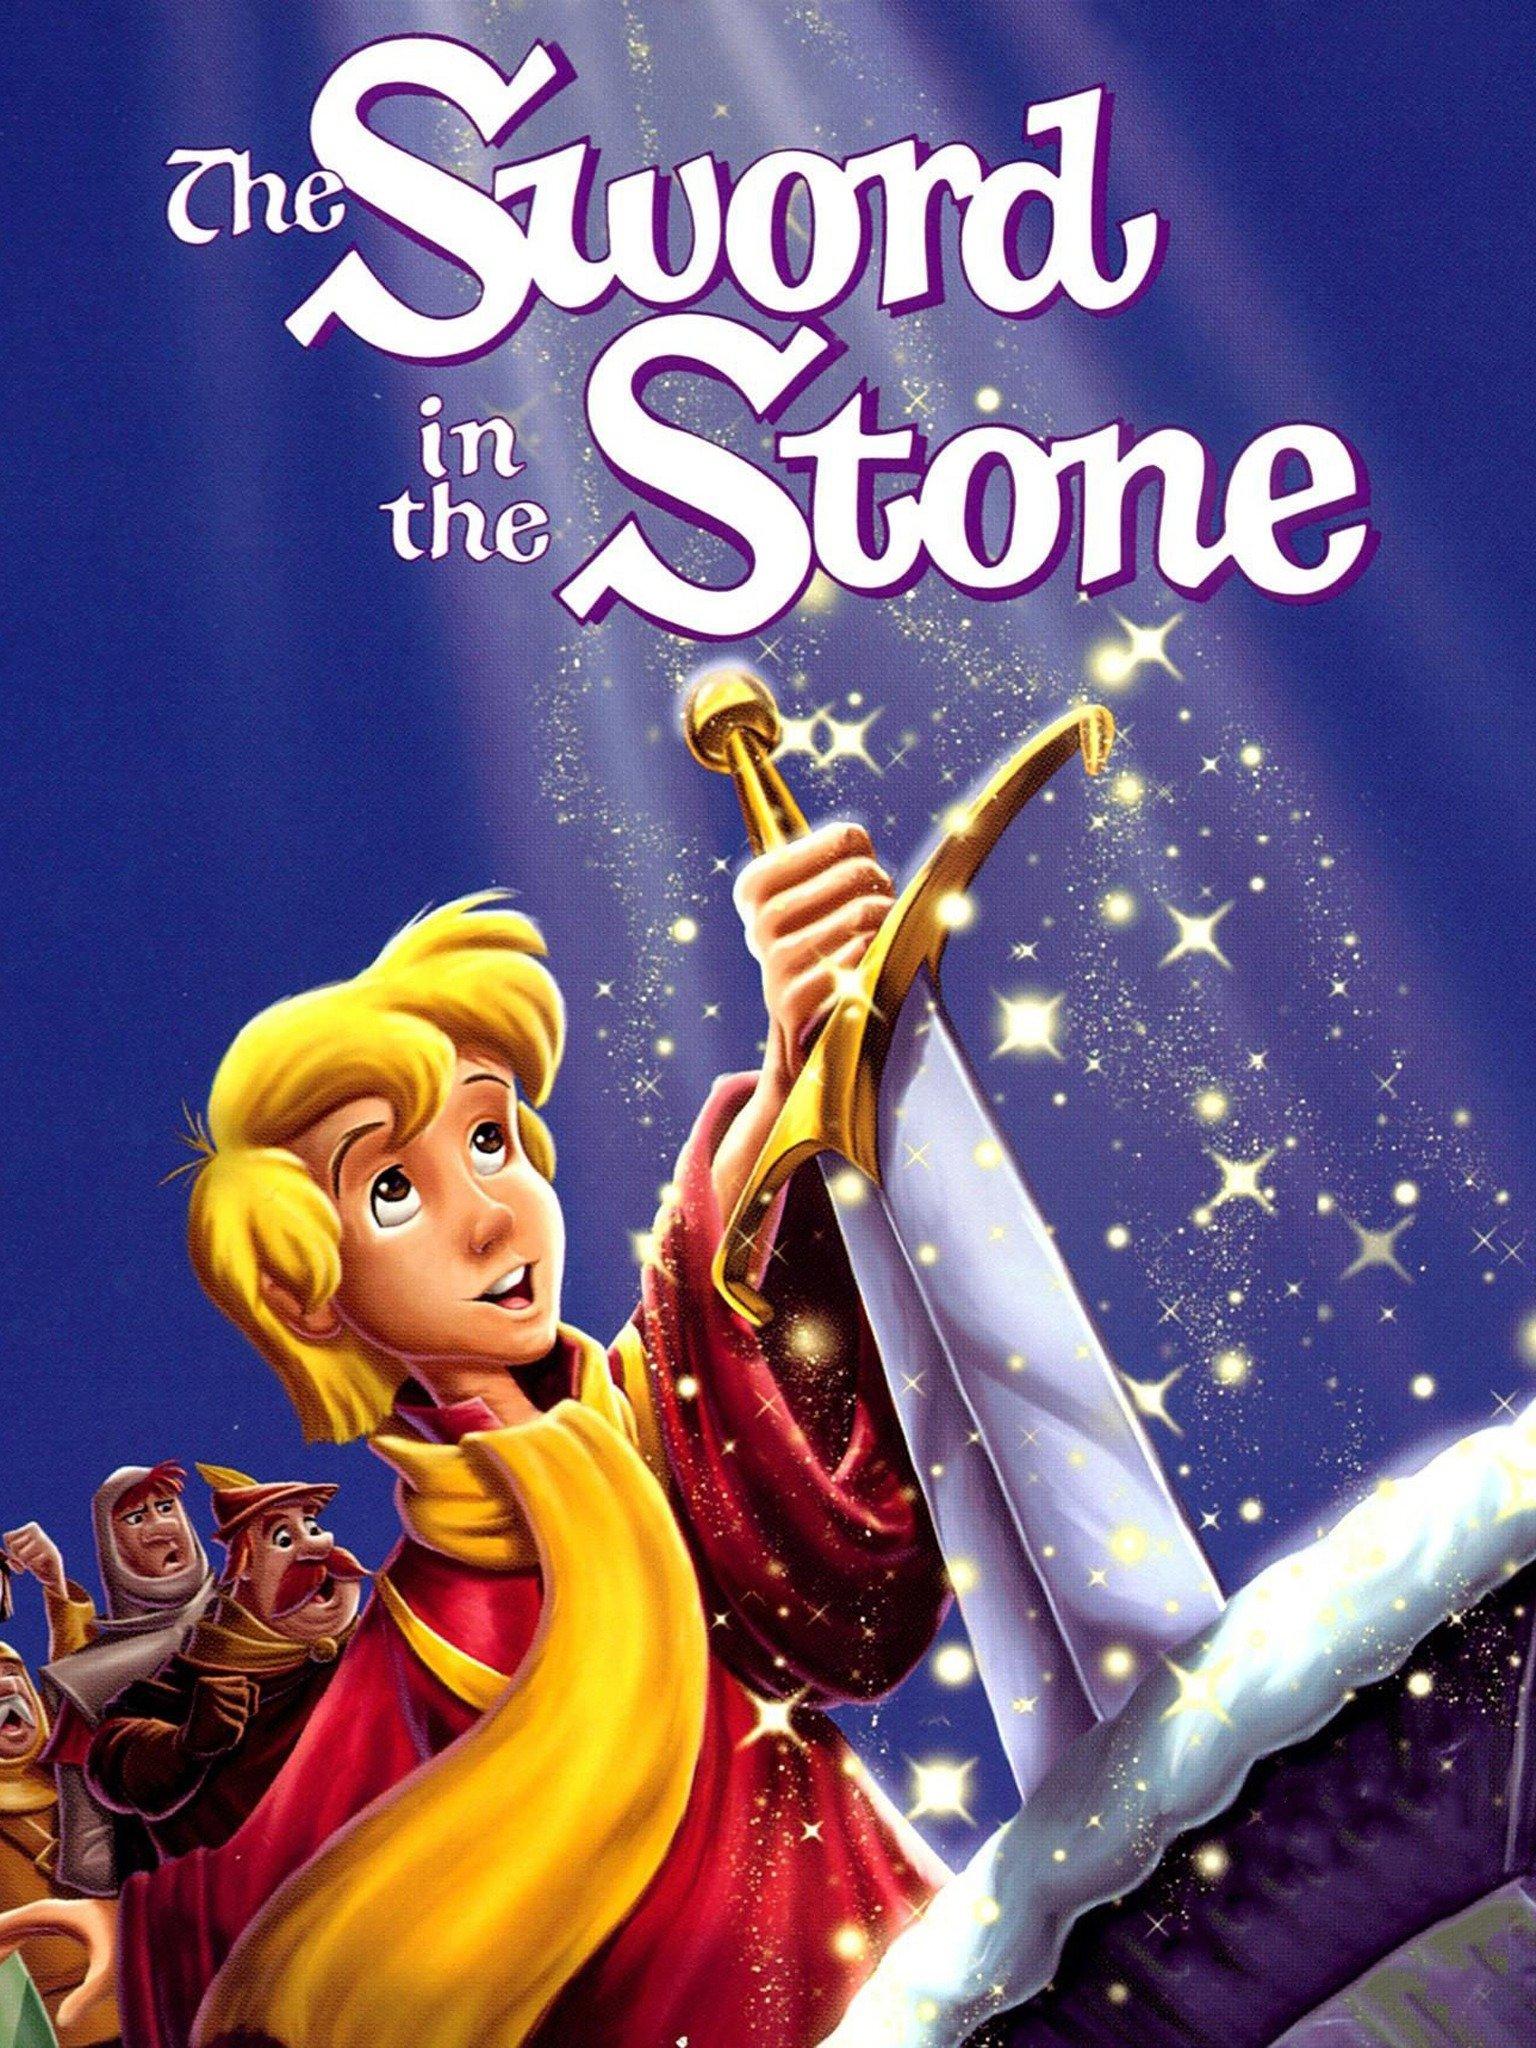 Merlin L'enchanteur Disney Streaming : merlin, l'enchanteur, disney, streaming, Sword, Stone, (1963), Rotten, Tomatoes